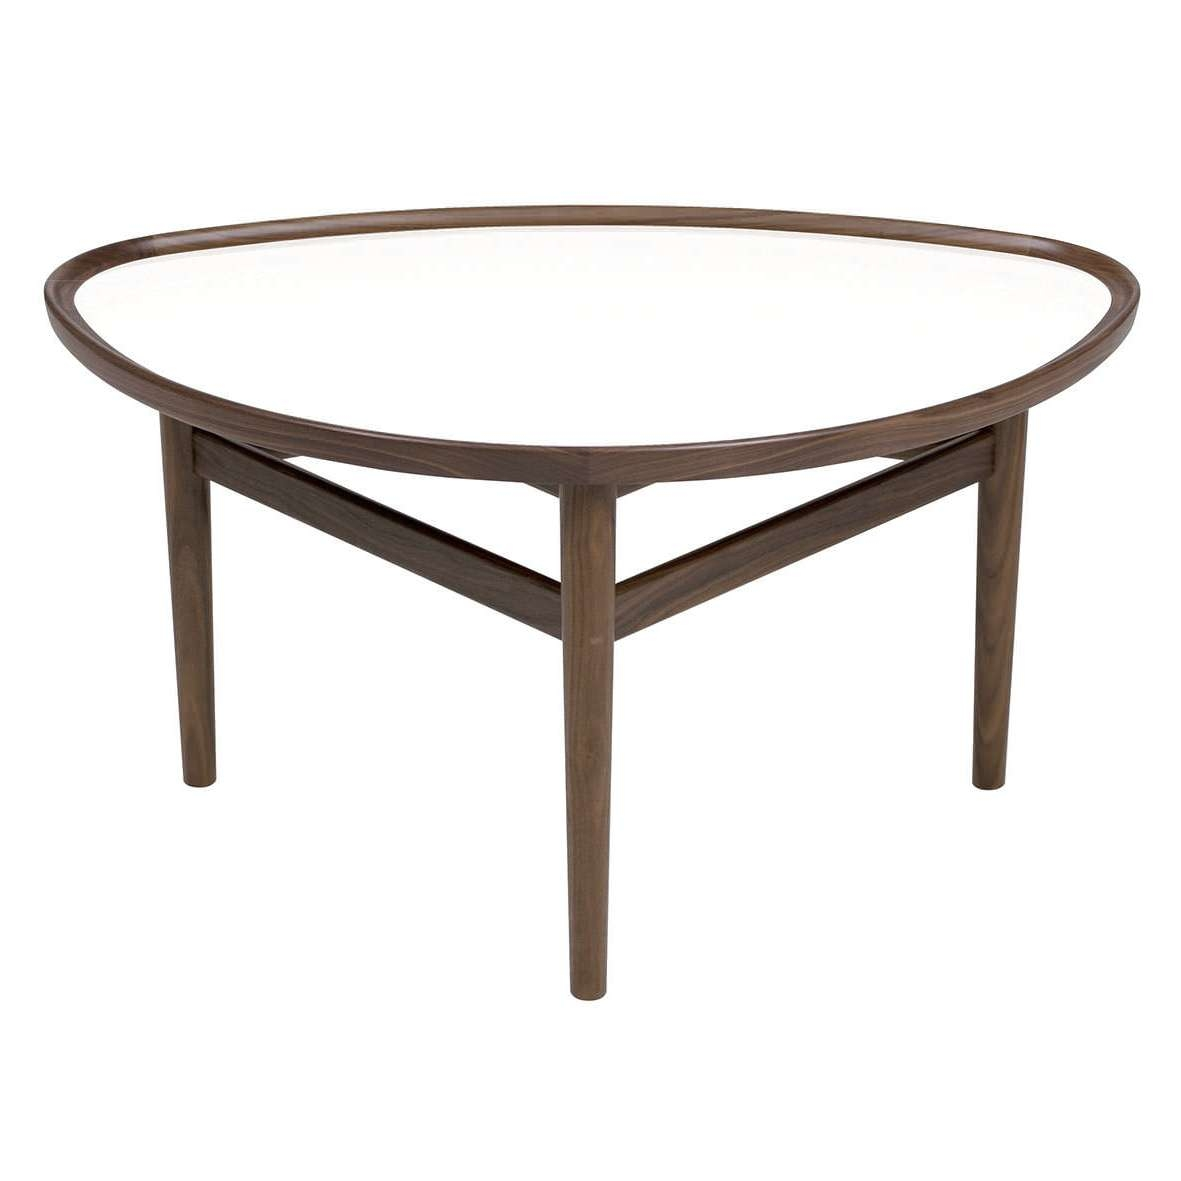 Scandinavian Design Coffee Table / Walnut / Teak / Oval – Eye In Most Up To Date Oval Walnut Coffee Tables (View 16 of 20)